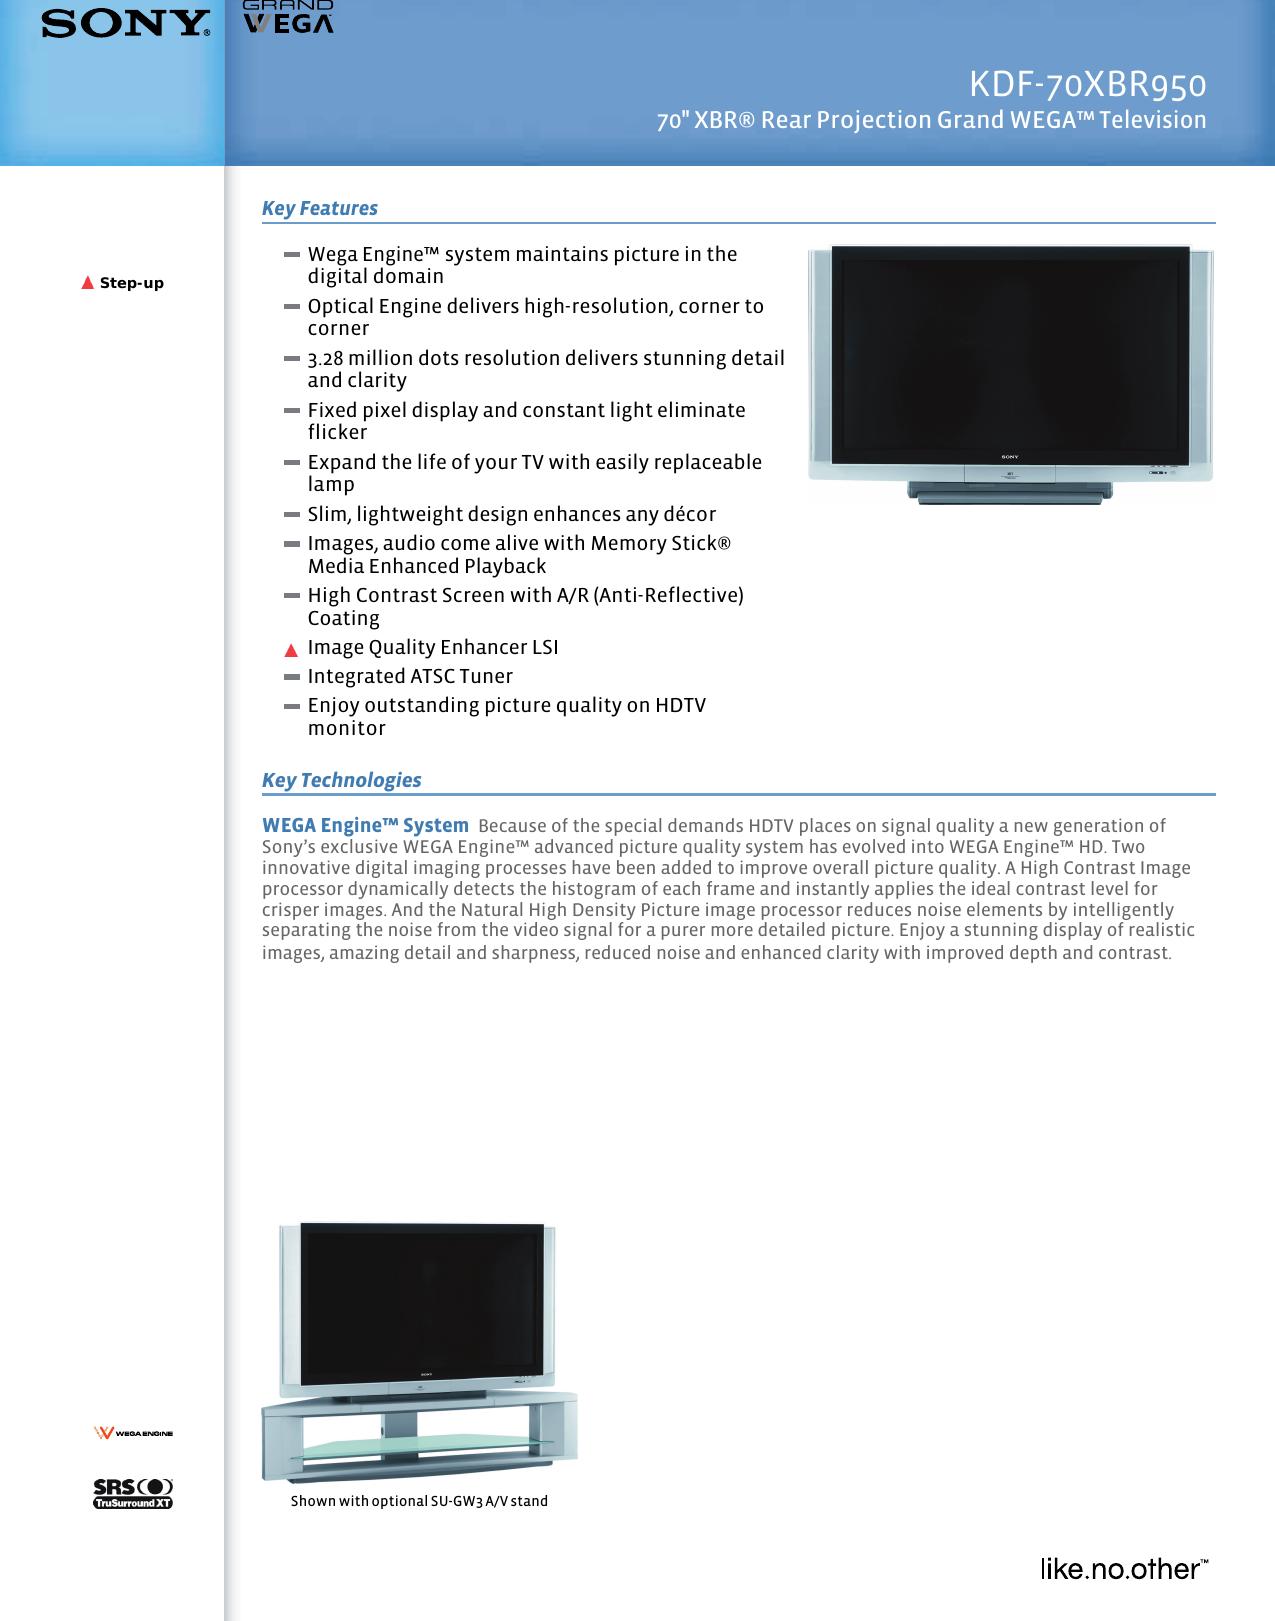 sony kdf 70xbr950 user manual marketing specifications kdf70xbr950 mksp rh usermanual wiki Sony KDF-70XBR950 Back Sony KDF-70XBR950 Back